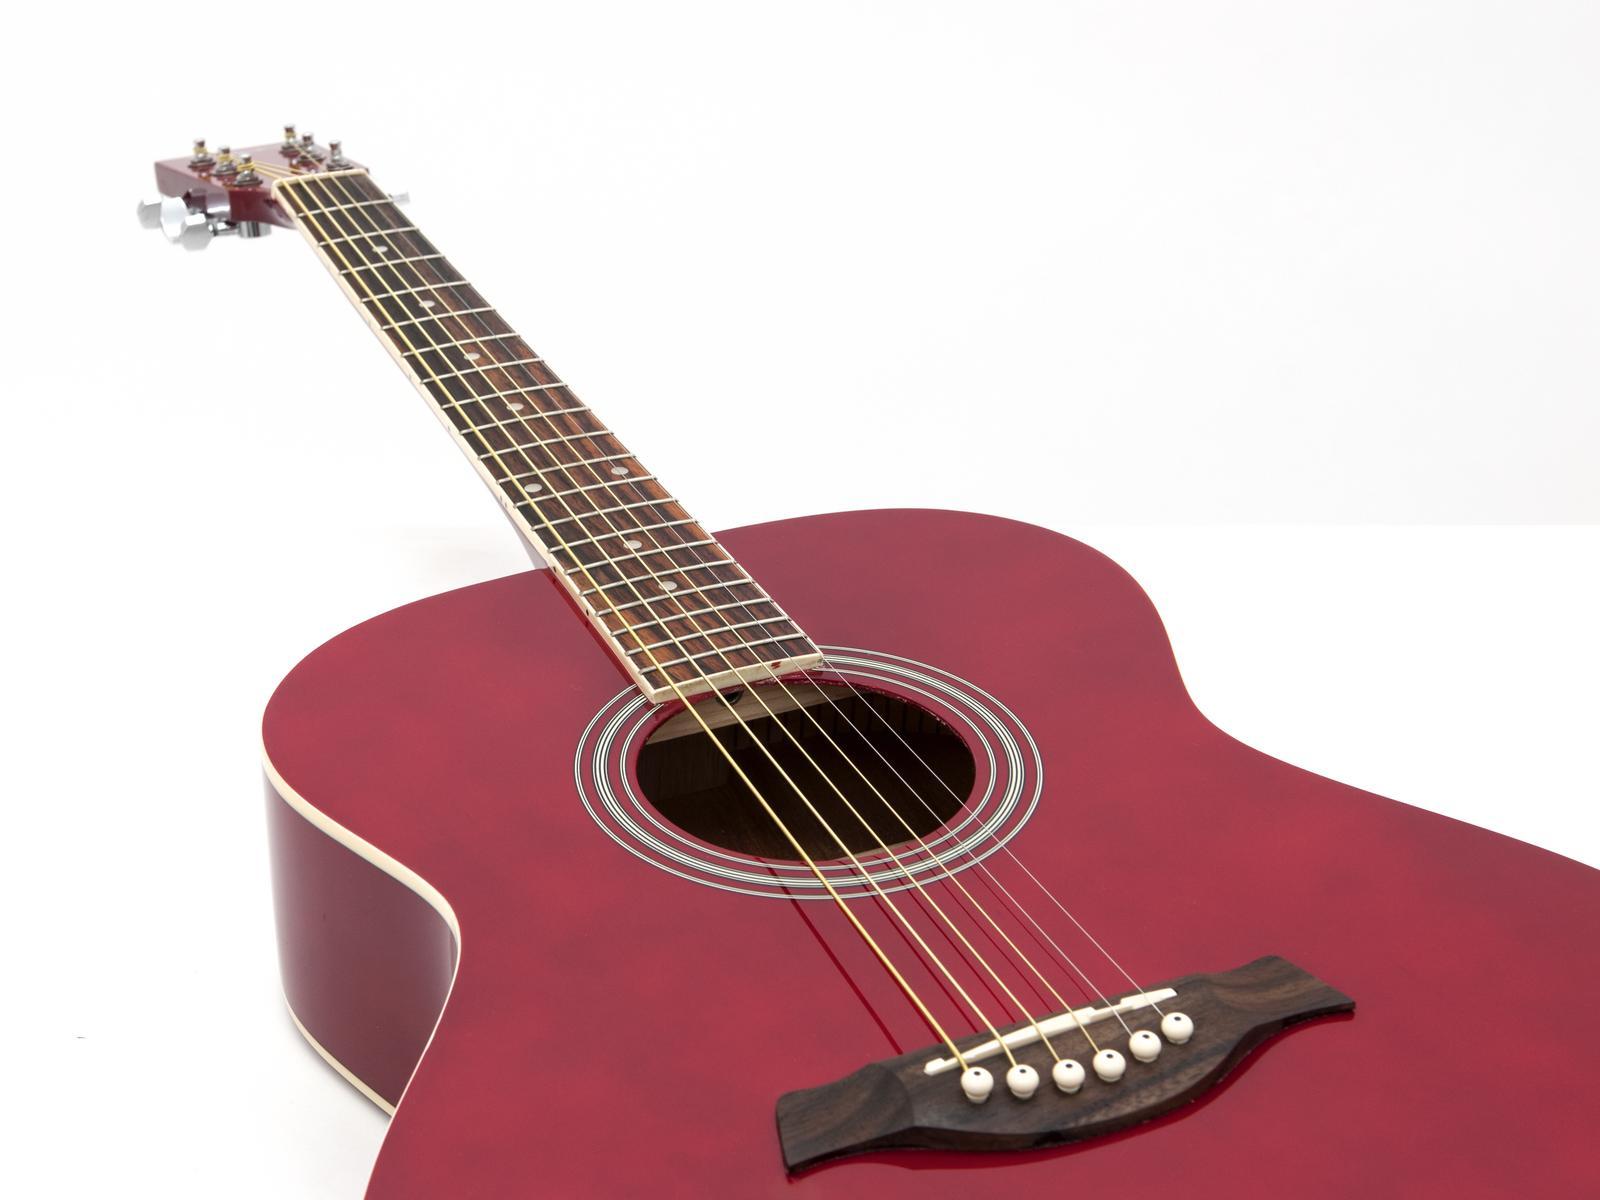 Chitarra acustica rossa DIMAVERY AW-303